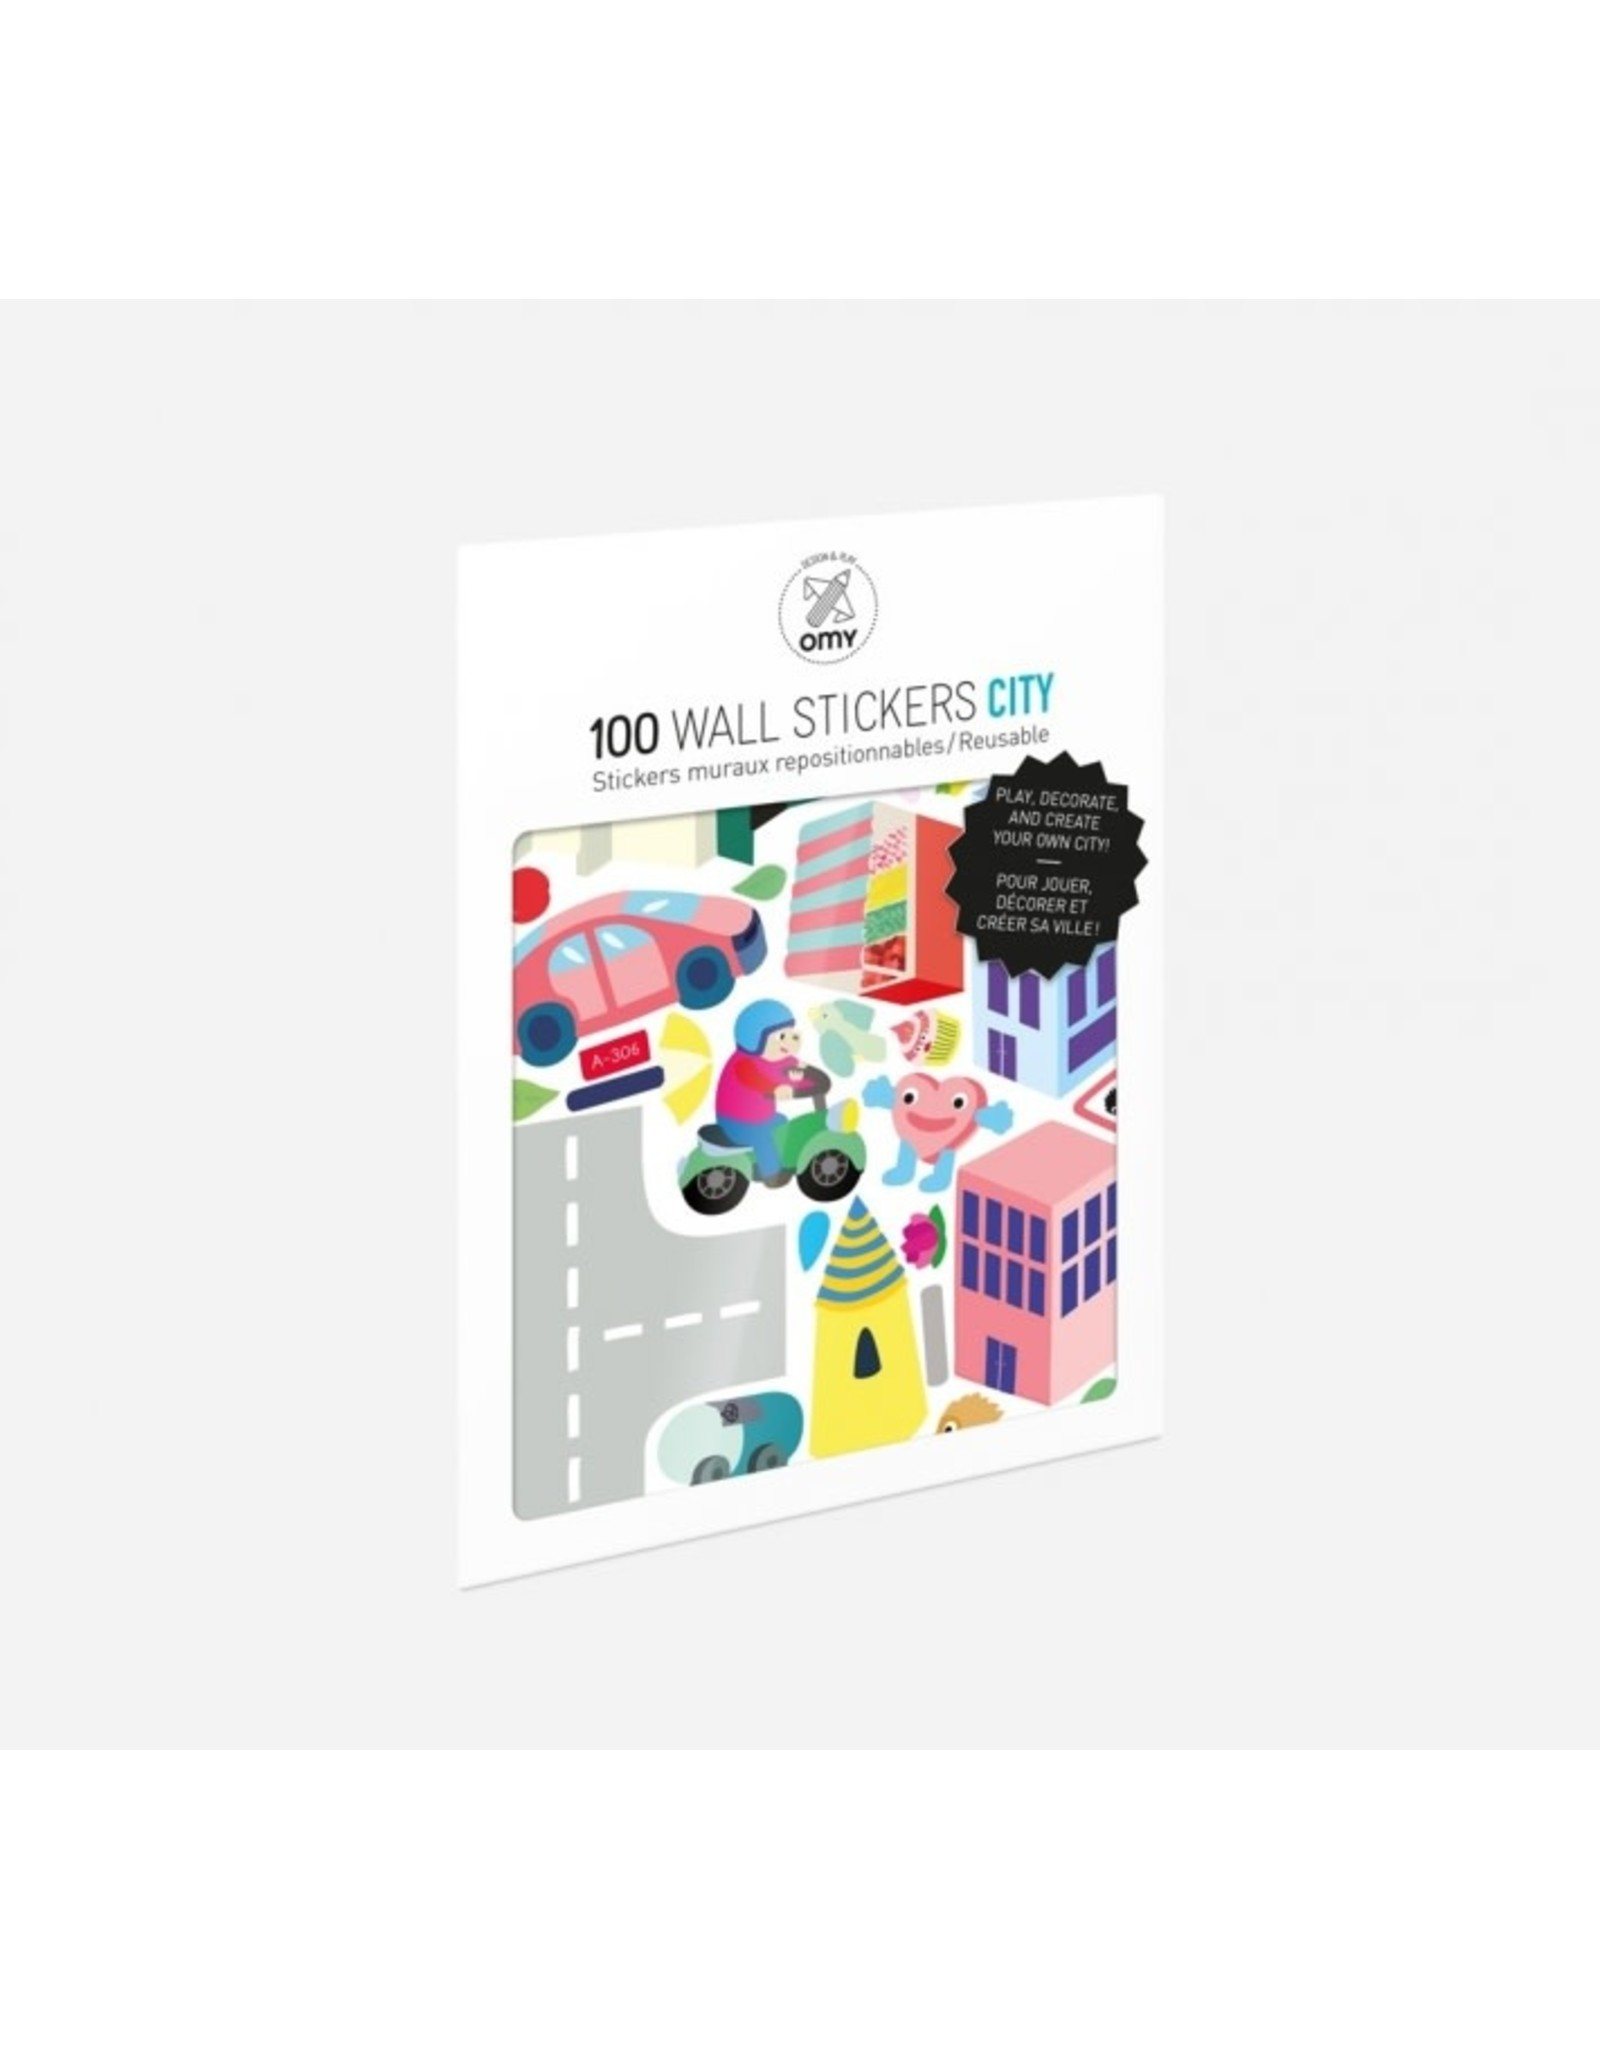 OMY Set of Stickers - City